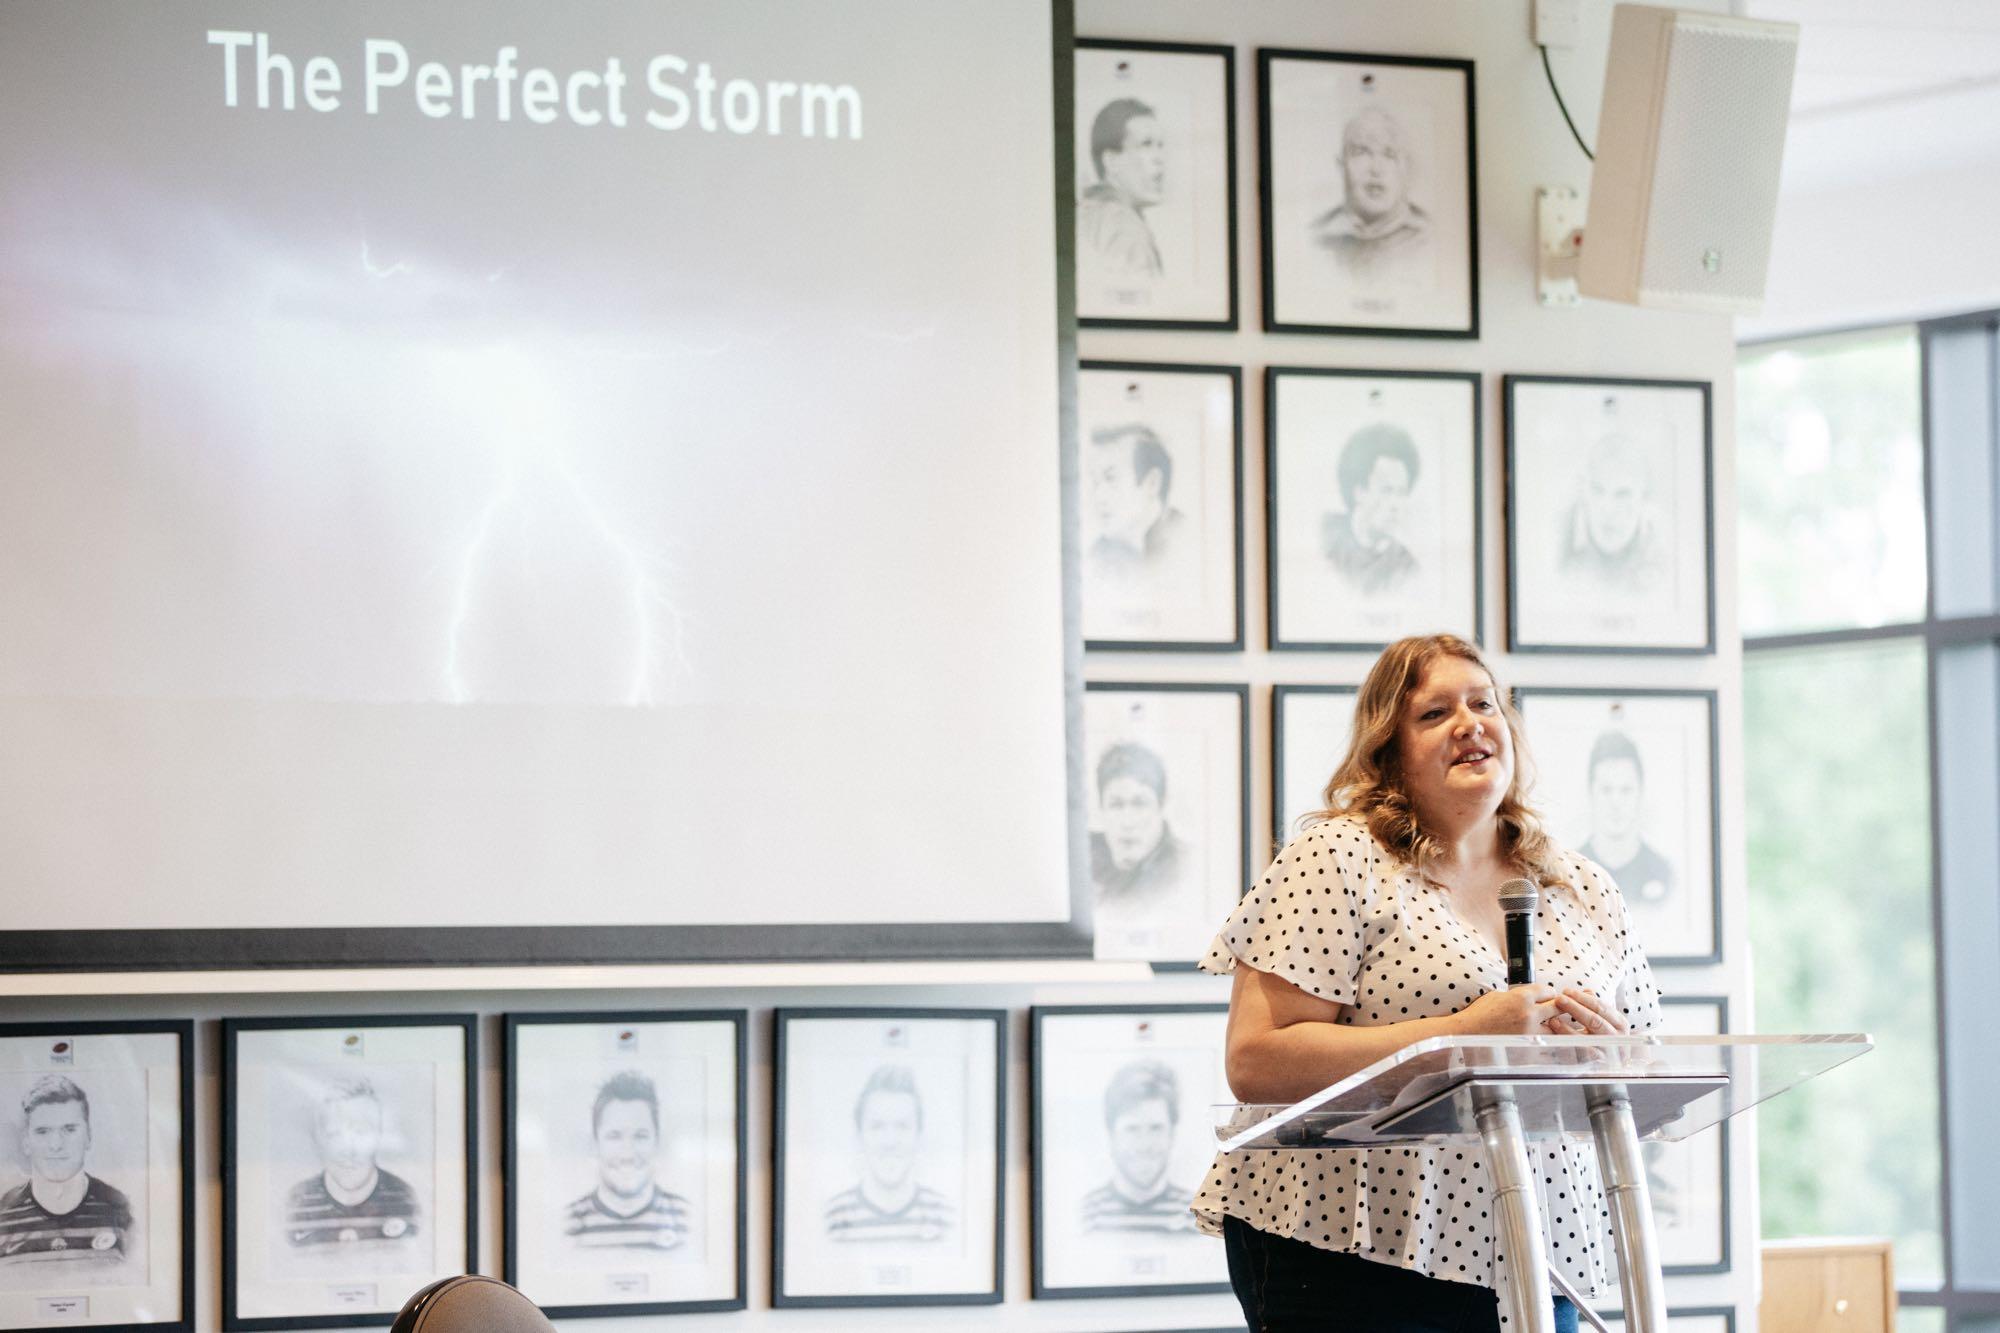 How Sheffield 'suicide survivor' Kathryn Little wood rebuilt her life from rock bottom